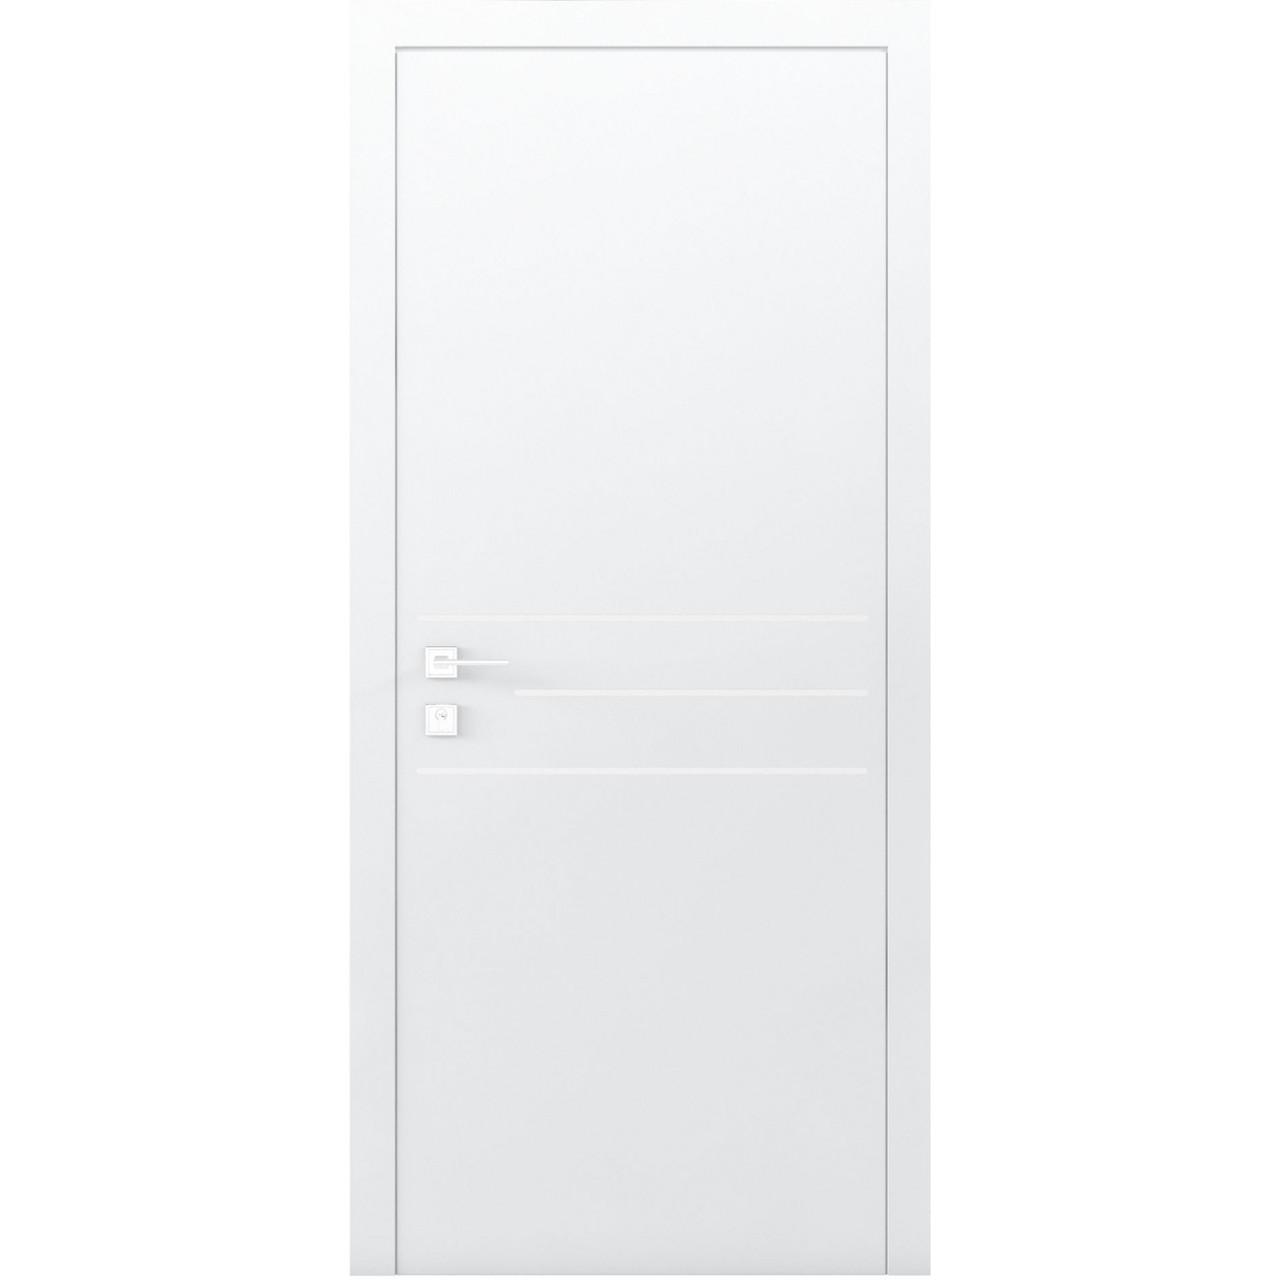 Міжкімнатні двері Rodos Кортес Prima 3G Глуха біла (полотно)